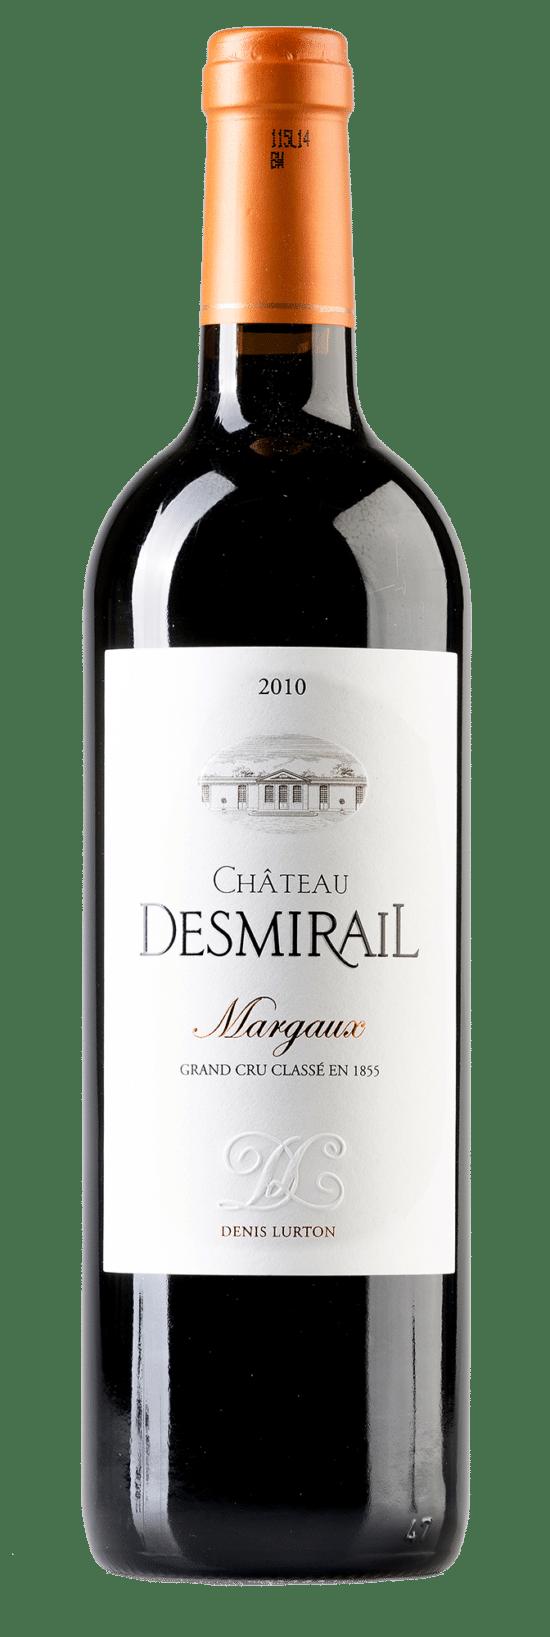 Château Desmirail Margaux